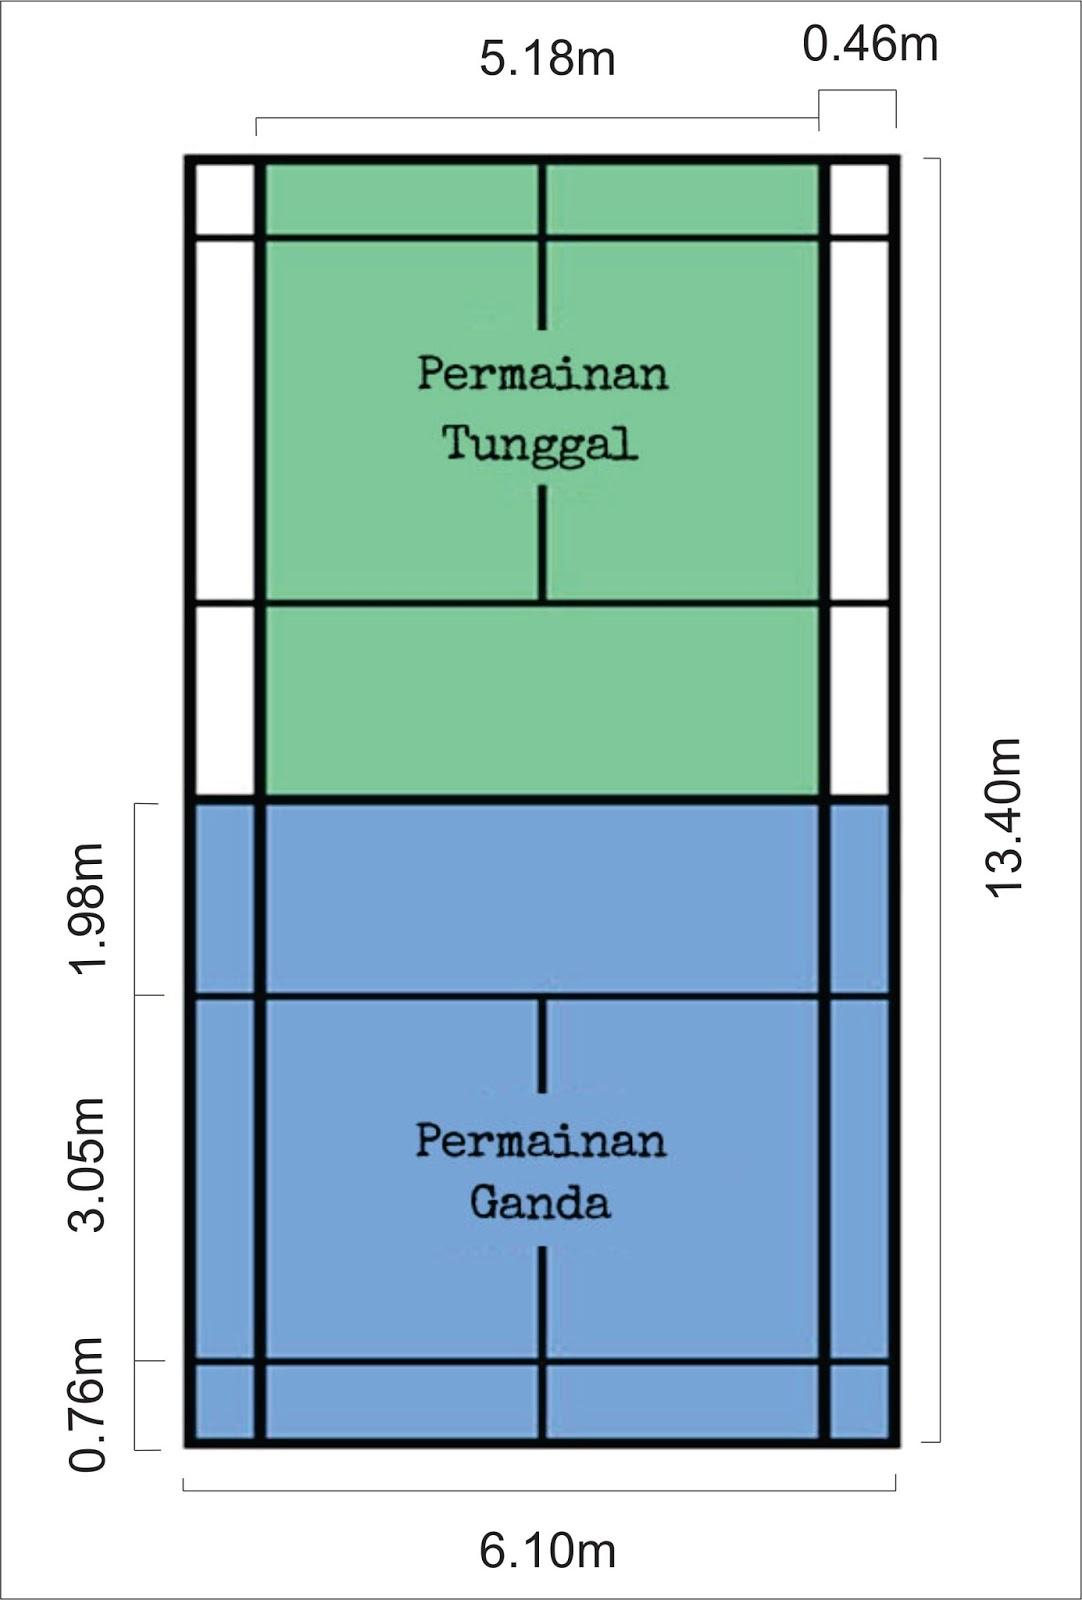 Luas Lapangan Bulu Tangkis : lapangan, tangkis